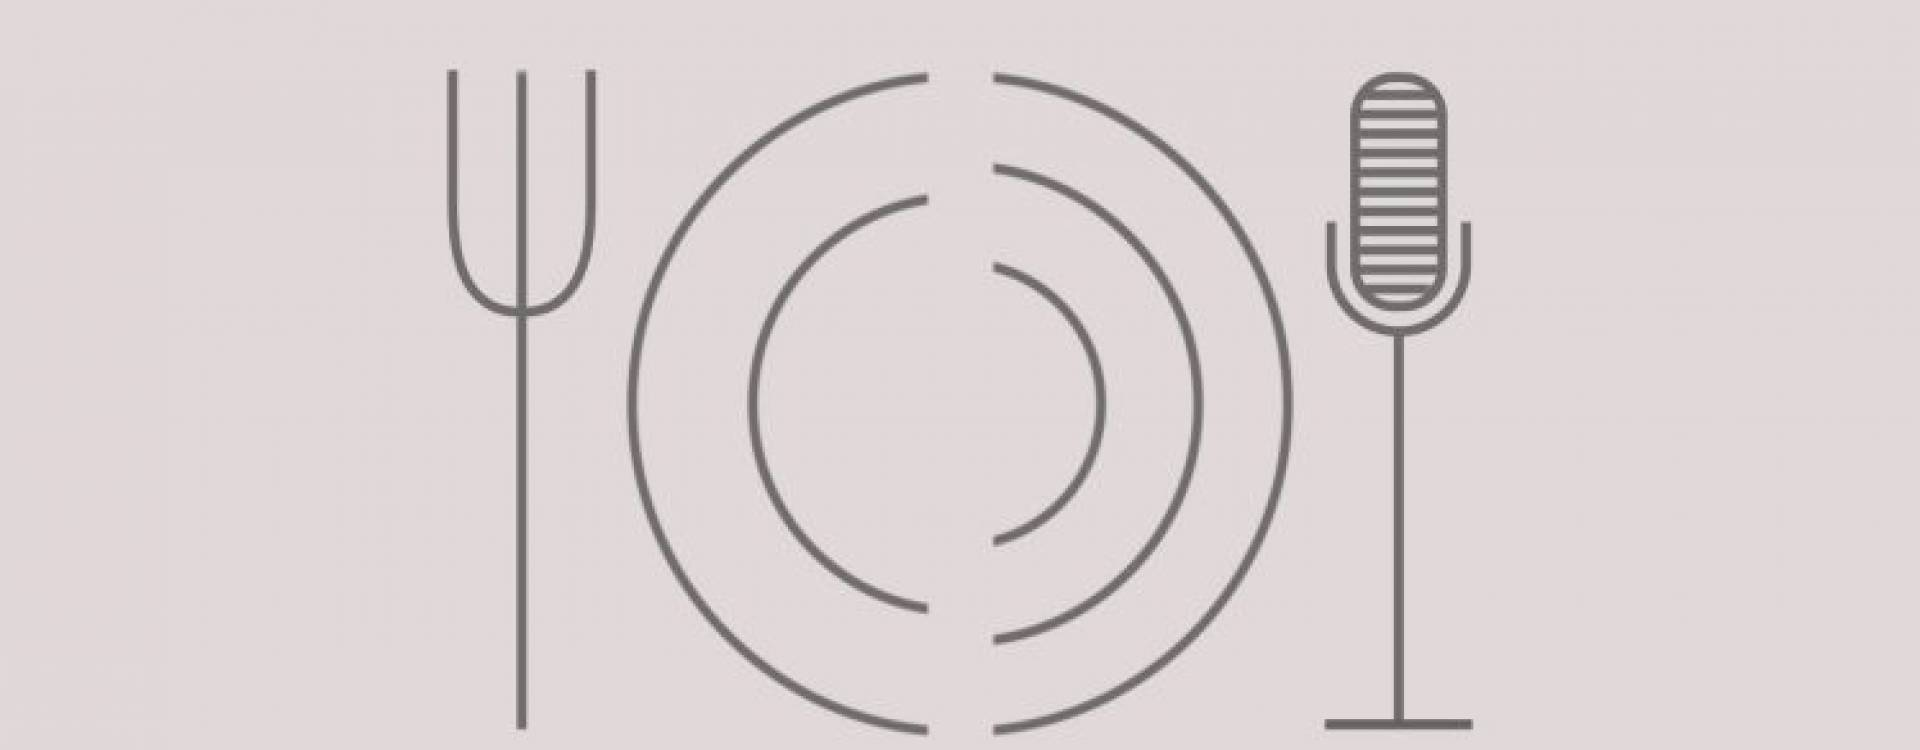 Orange Smarty Placeholder Logo